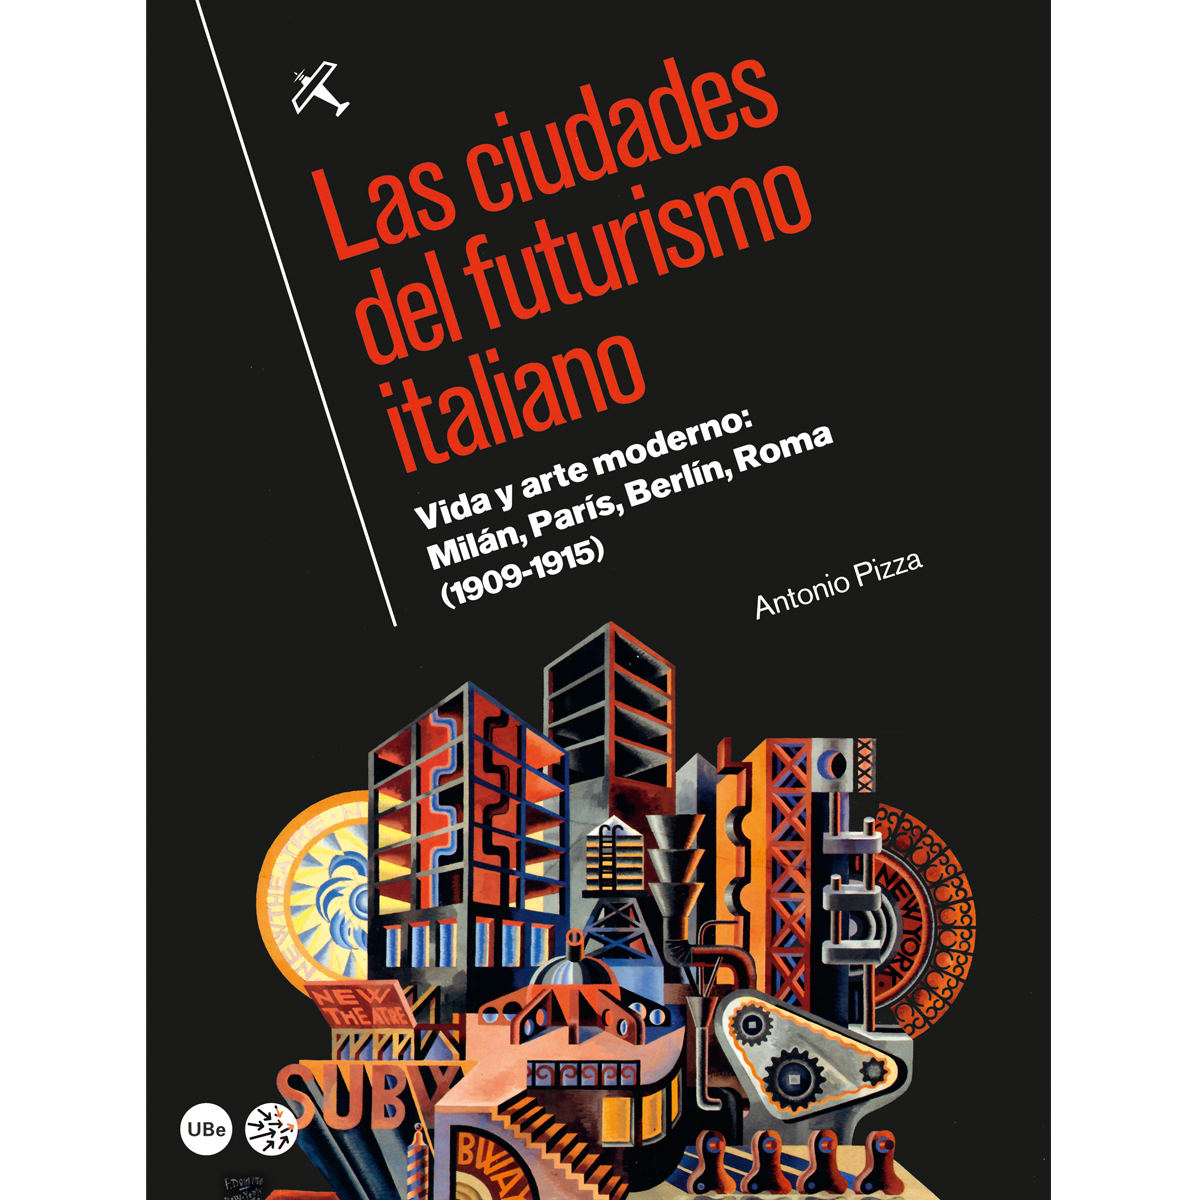 Las ciudades del futurismo italiano